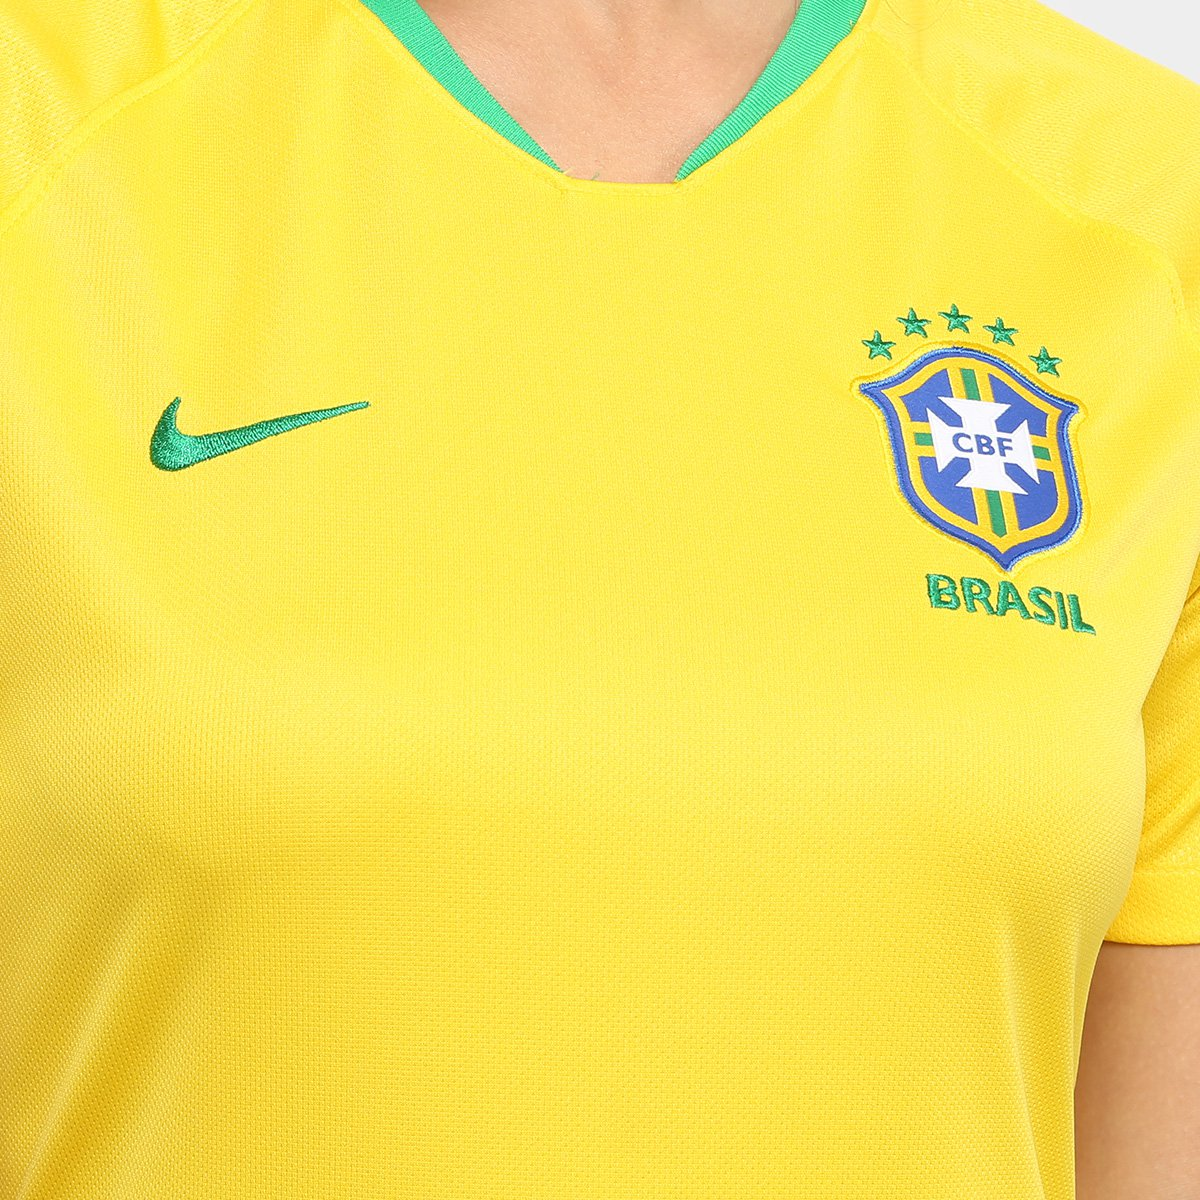 Camisa Seleção Brasil I 2018 s n° - Torcedor Nike Feminina - Amarelo ... f6dc256edd8b2